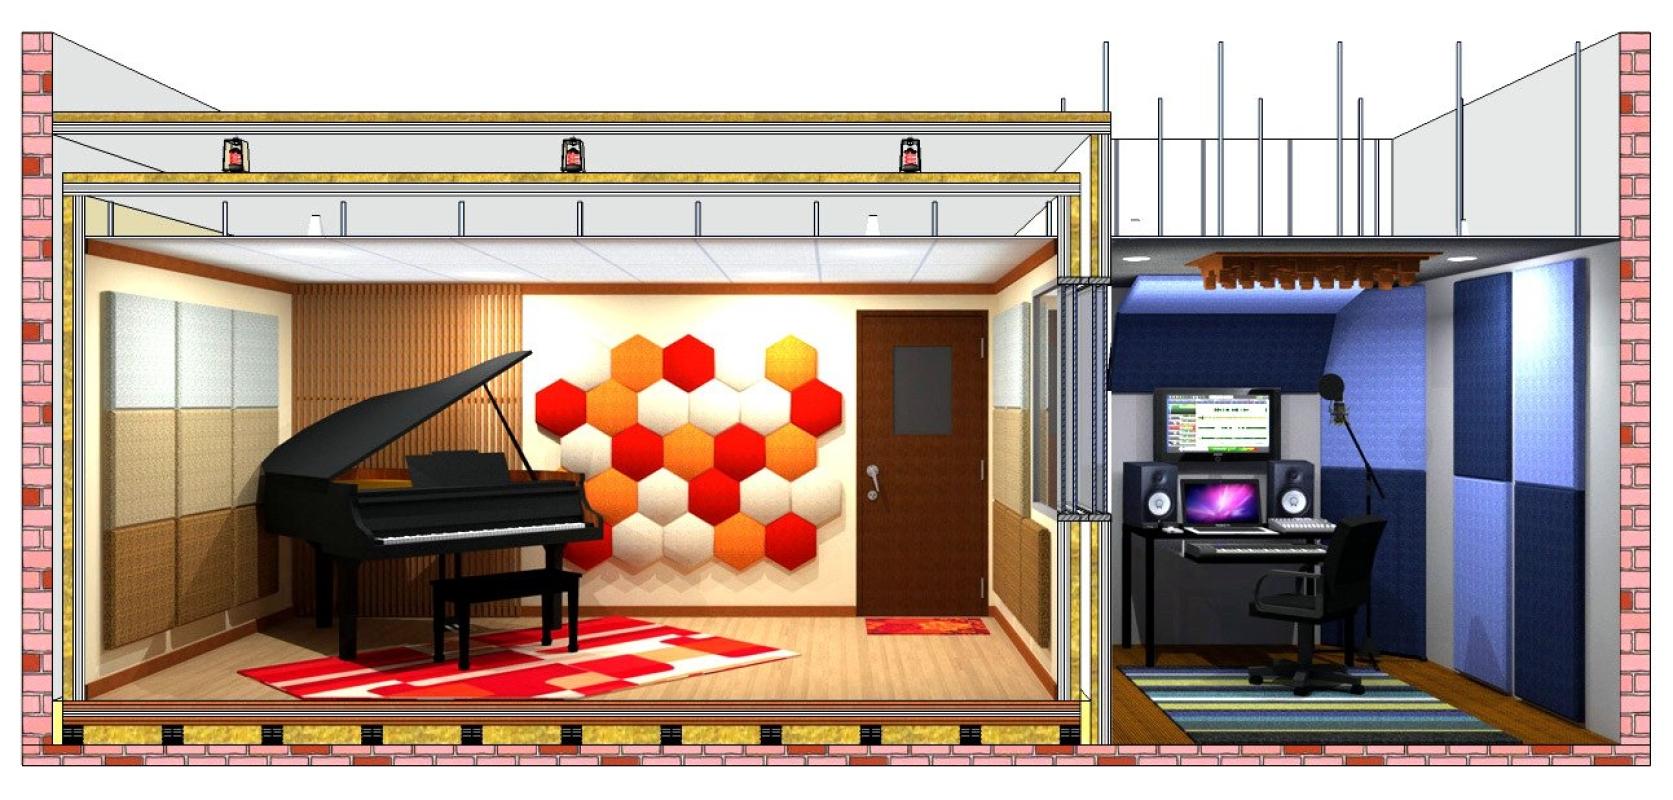 Studio Acoustical System Studio Acoustical System Malaysia, Selangor, Kuala Lumpur (KL), Shah Alam Supplier, Supply, Supplies, Service | ISTIQ Noise Control Sdn Bhd